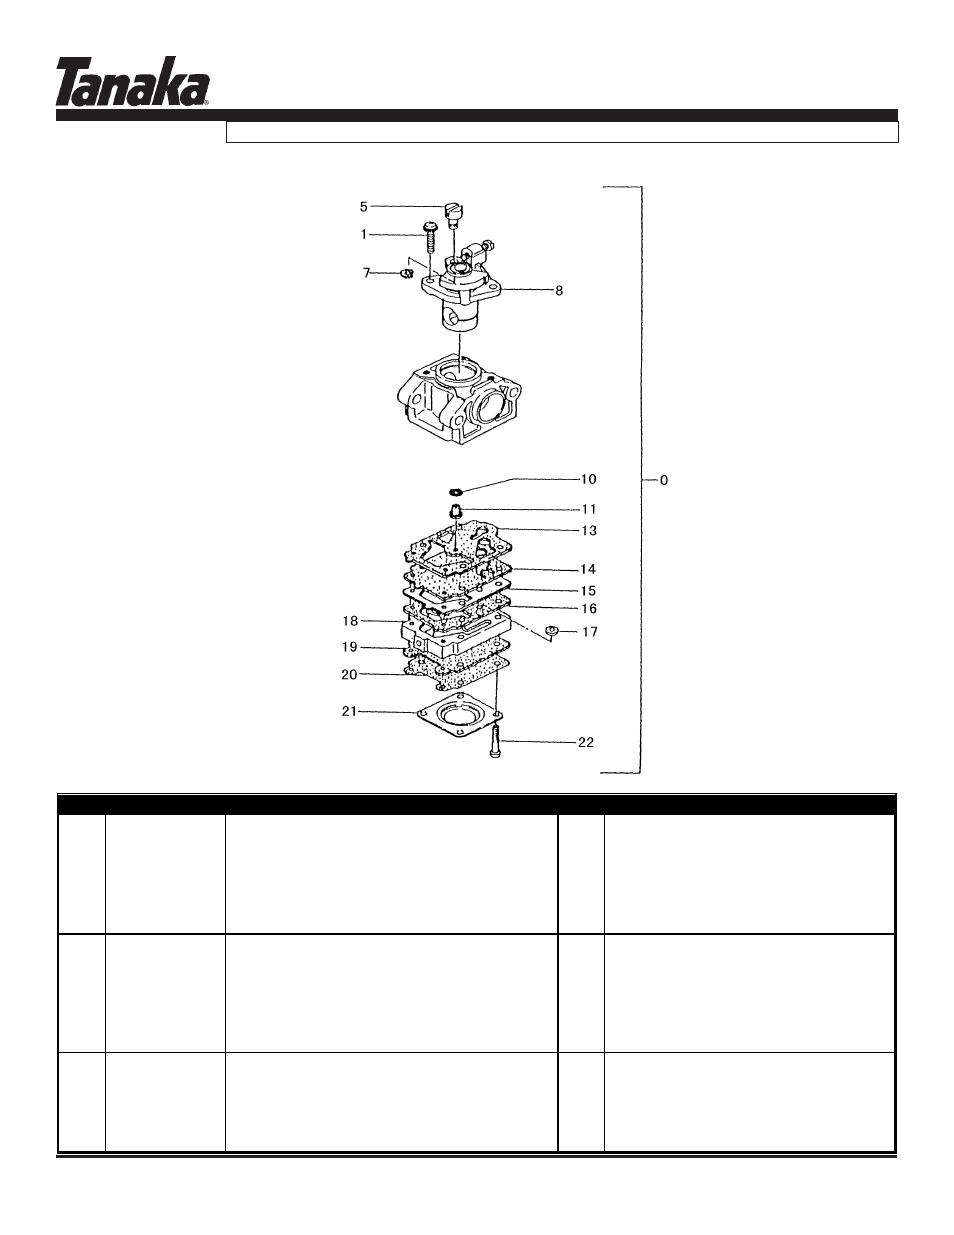 Carburetor (before s/n ~r233951), Tht-2120, Parts